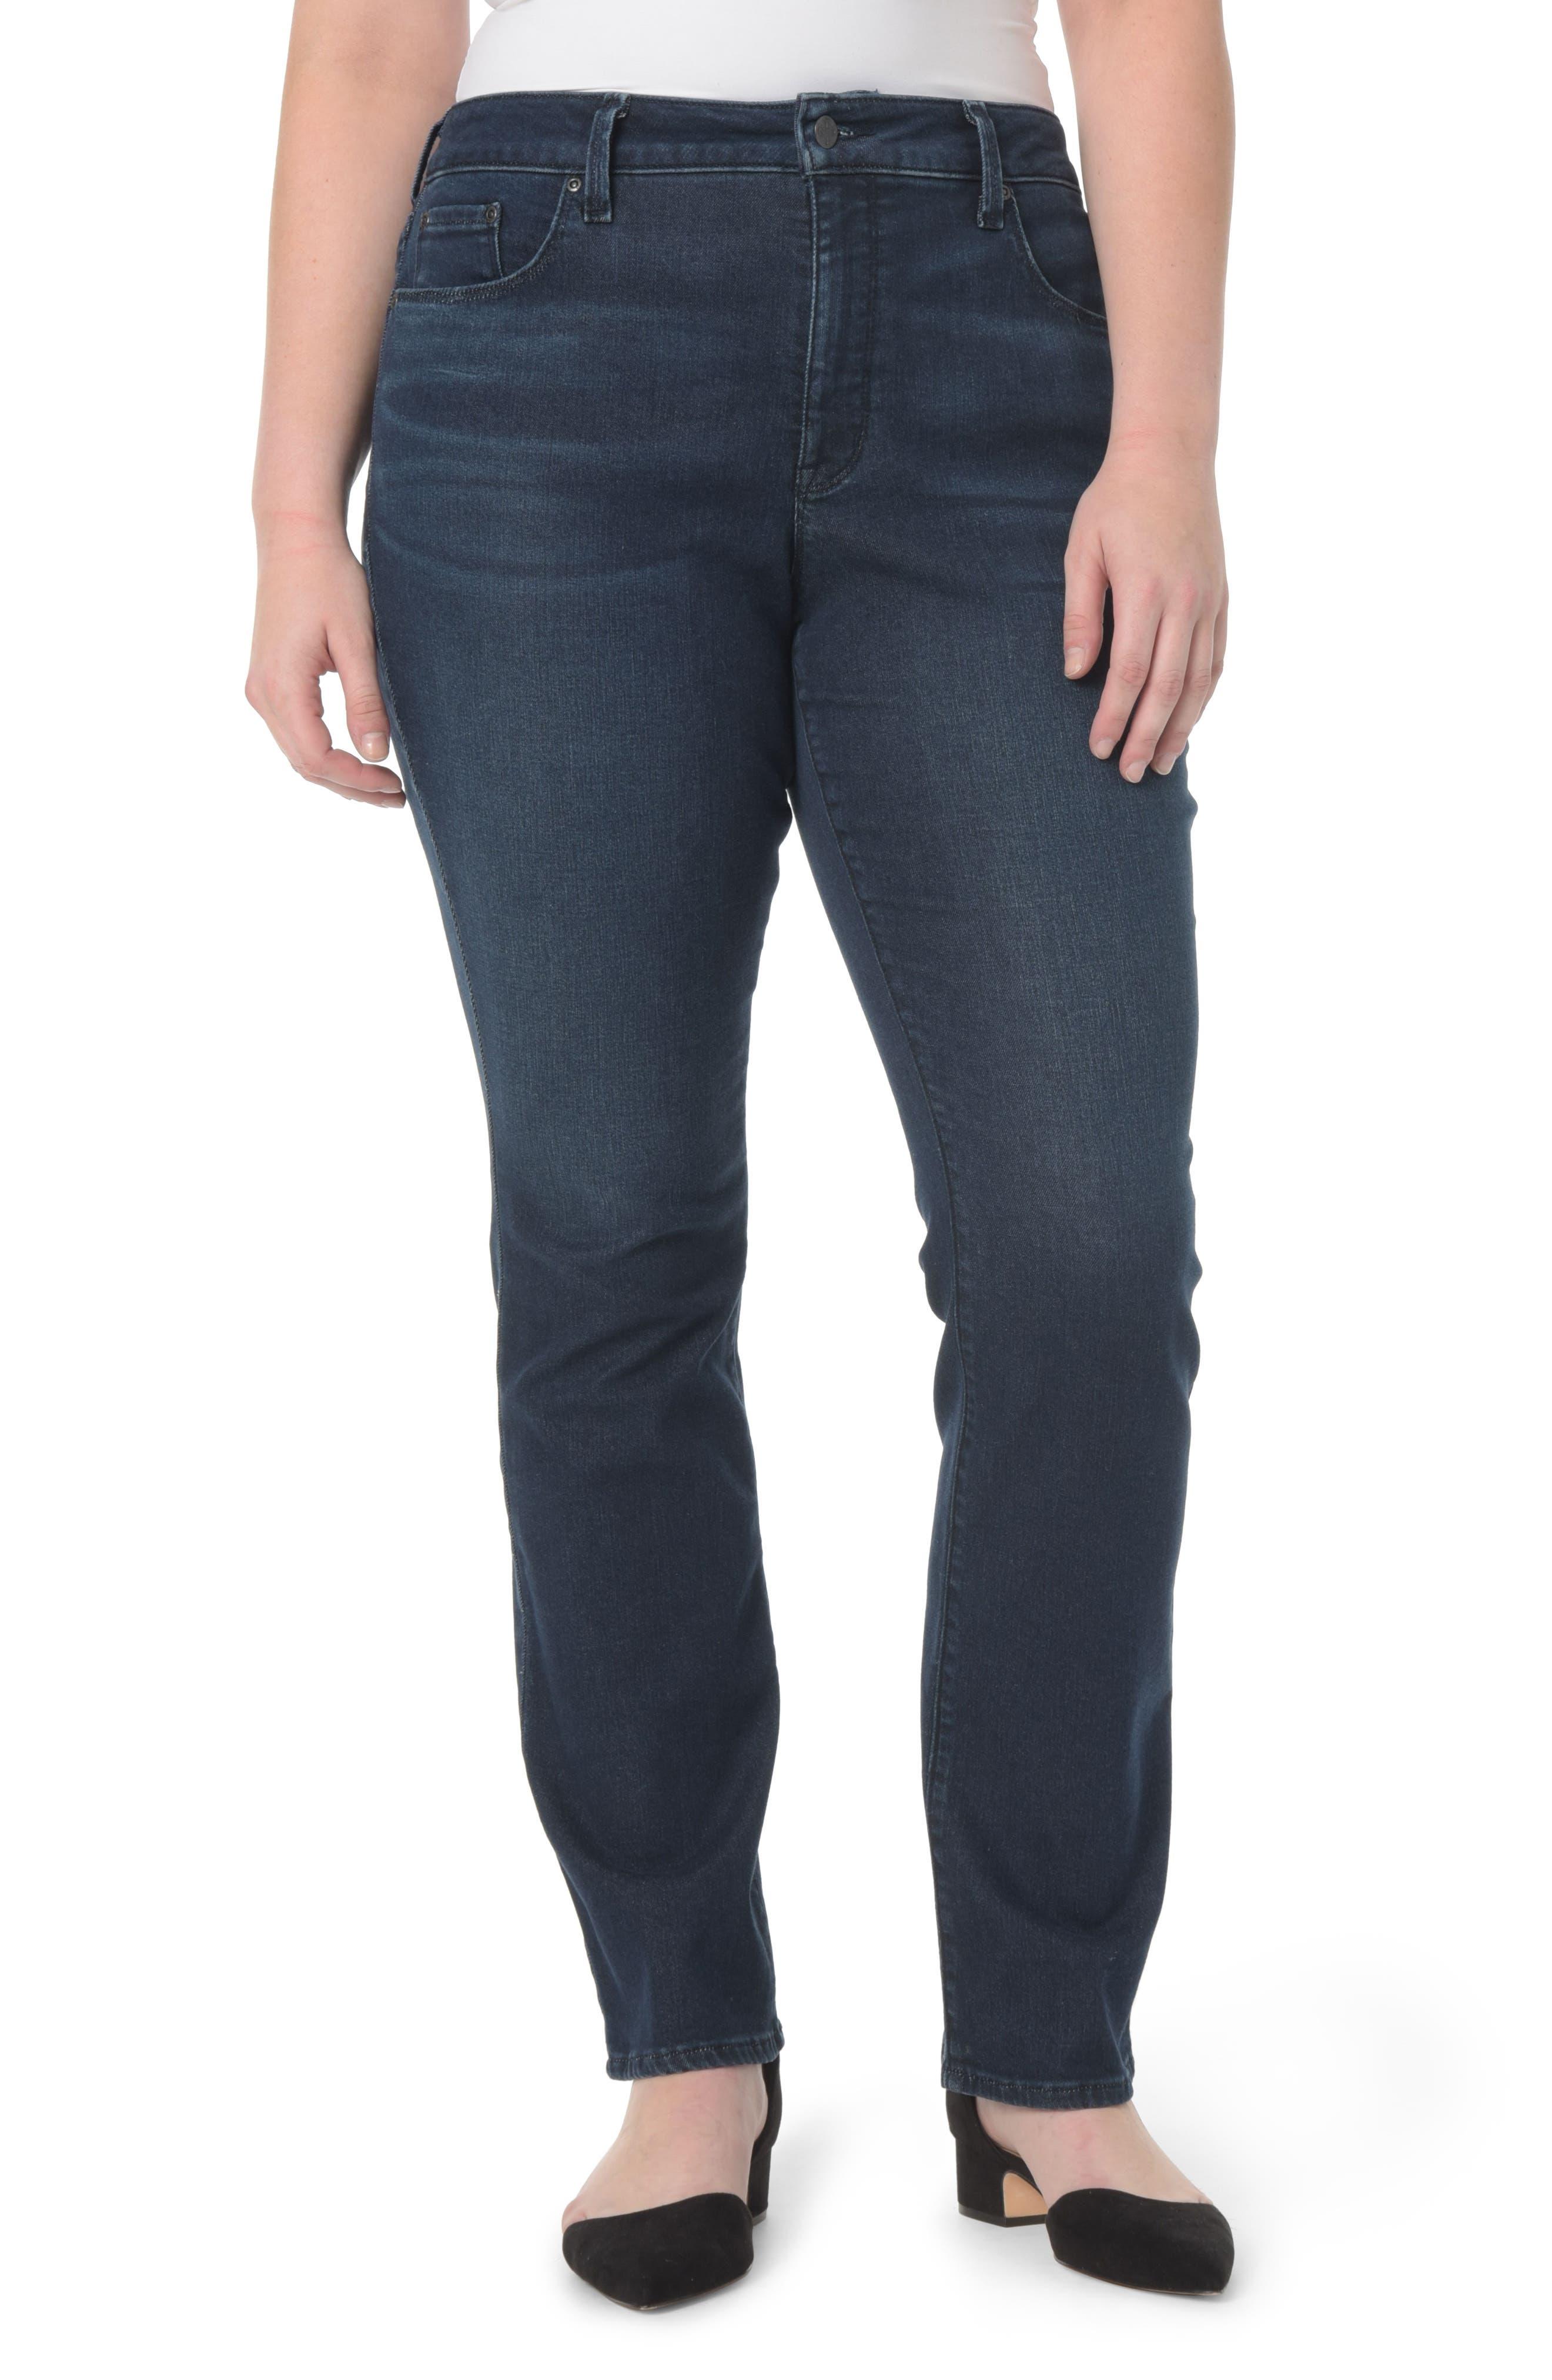 Main Image - NYDJ Marilyn Stretch Straight Leg Jeans (Morgan) (Plus Size)